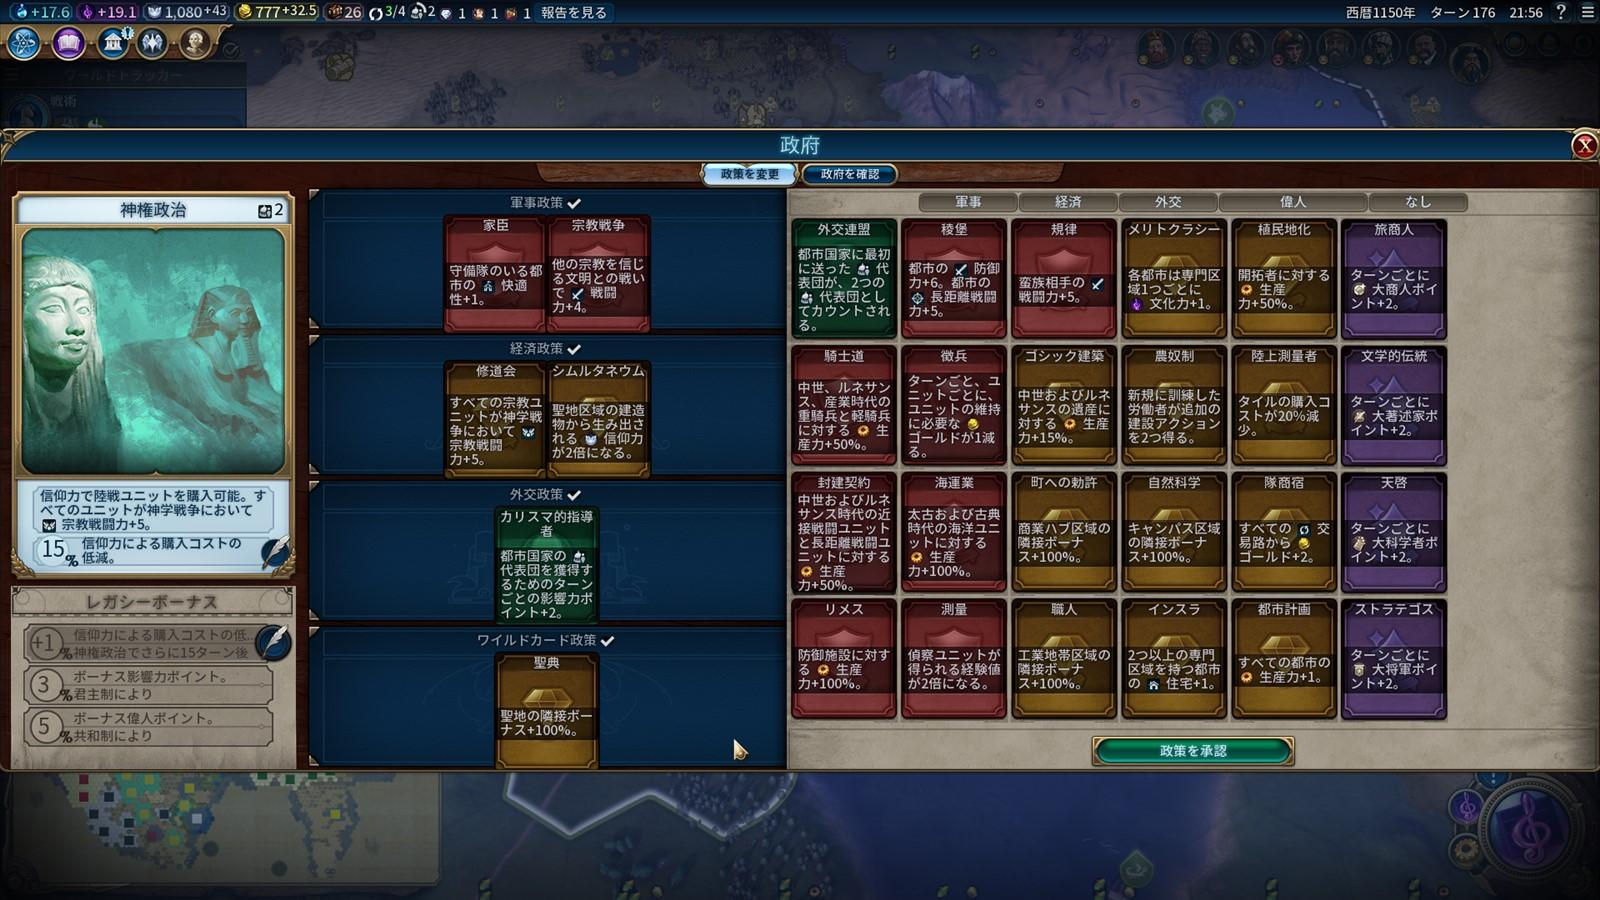 occ_qin012神権政治.jpg